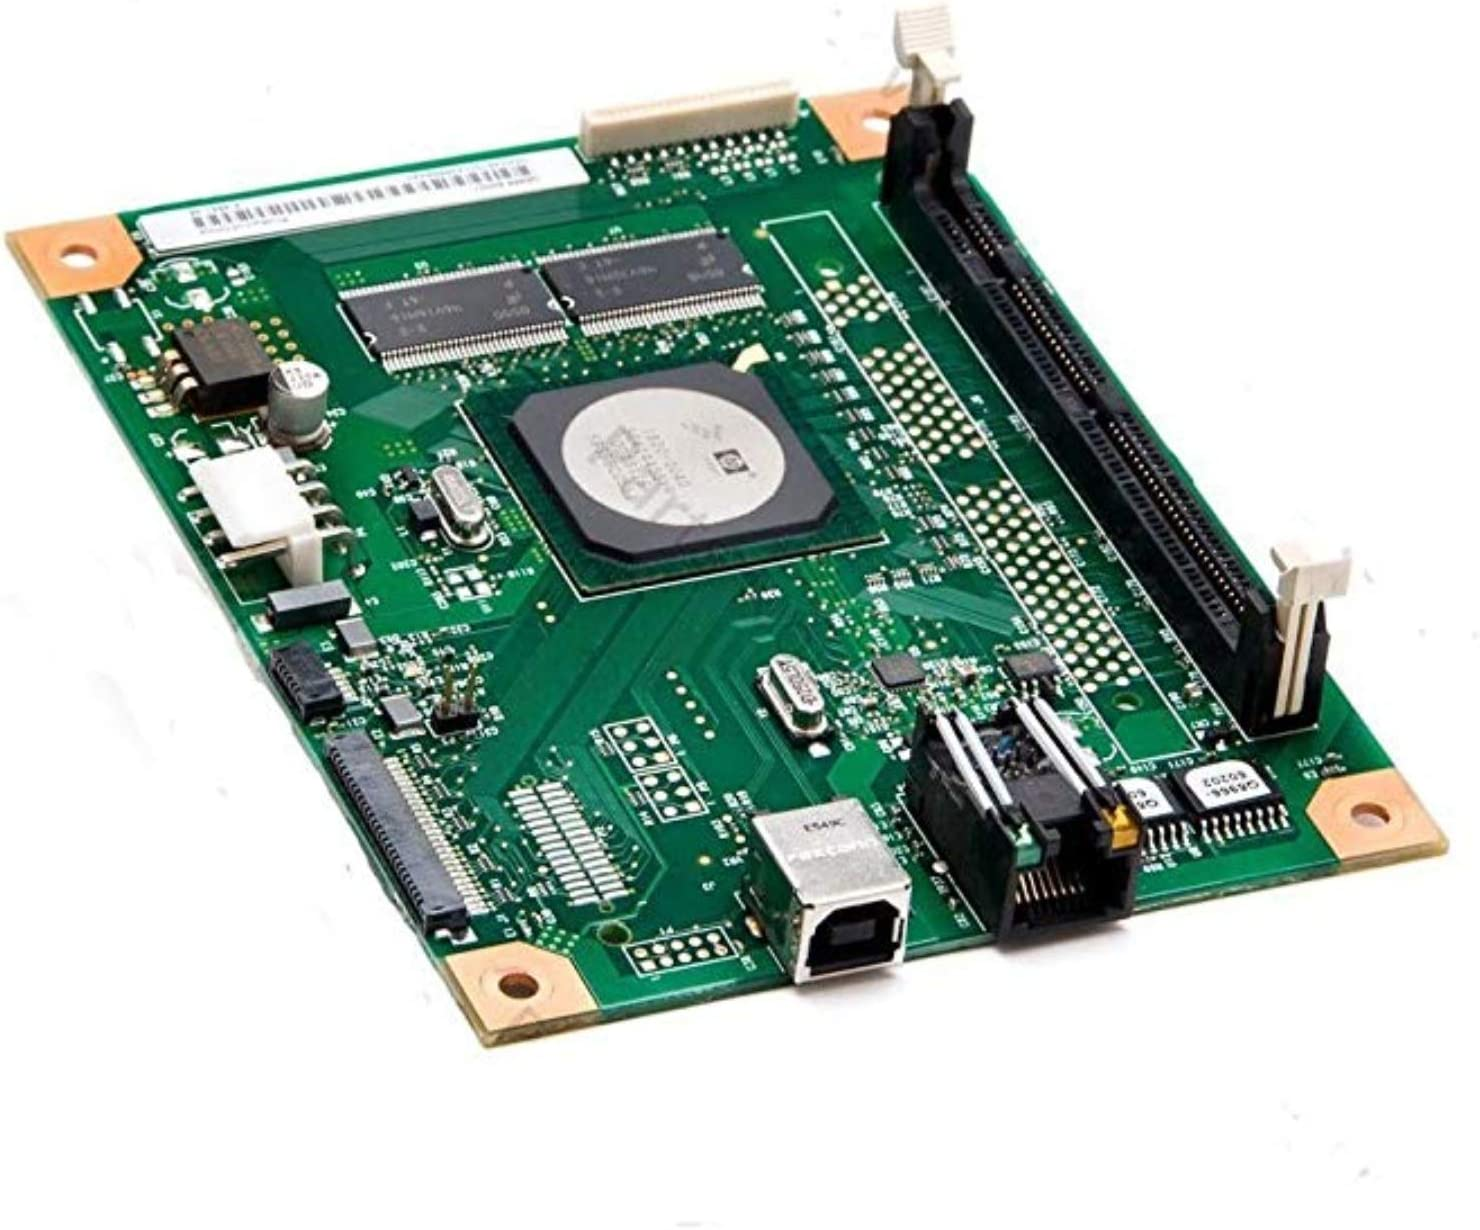 Amazon Com Mzfir Q5966 60001 For Hp Color Laserjet 2605n 2605dn Formatter Board Main Logic Board Computers Accessories